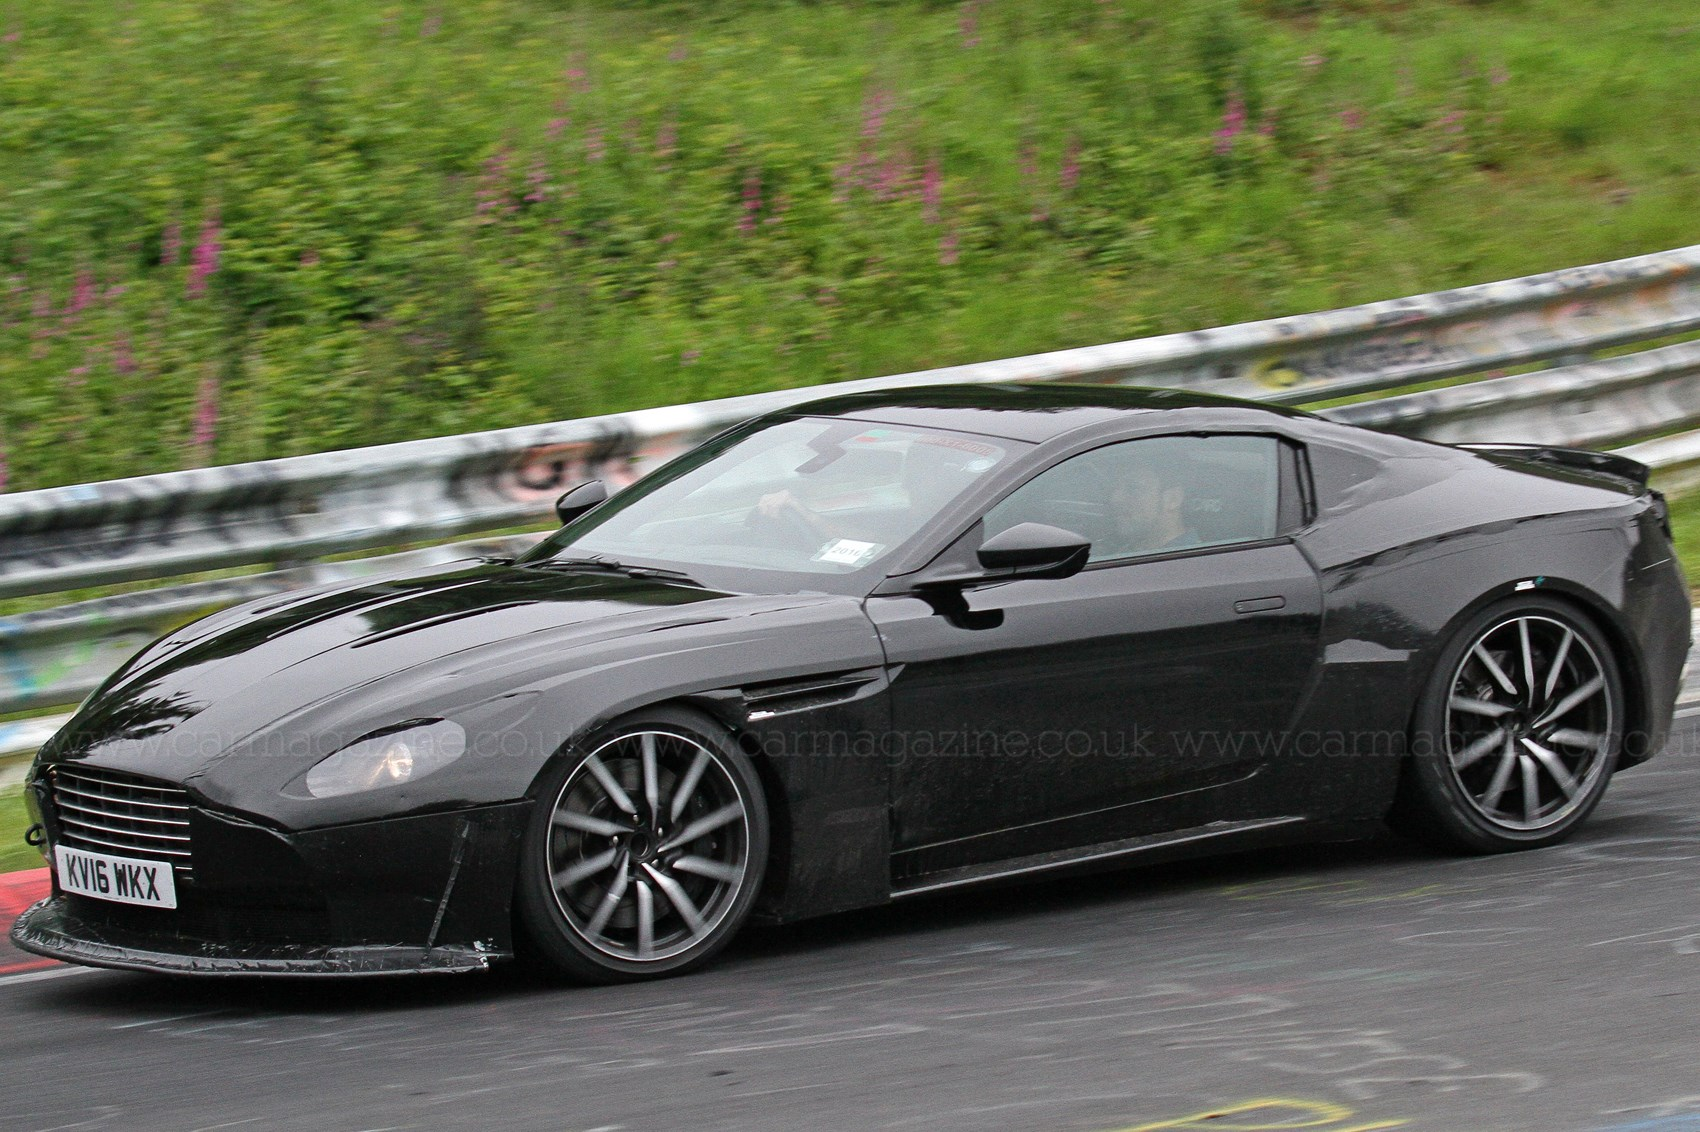 Aston Martin Vantage Backgrounds on Wallpapers Vista